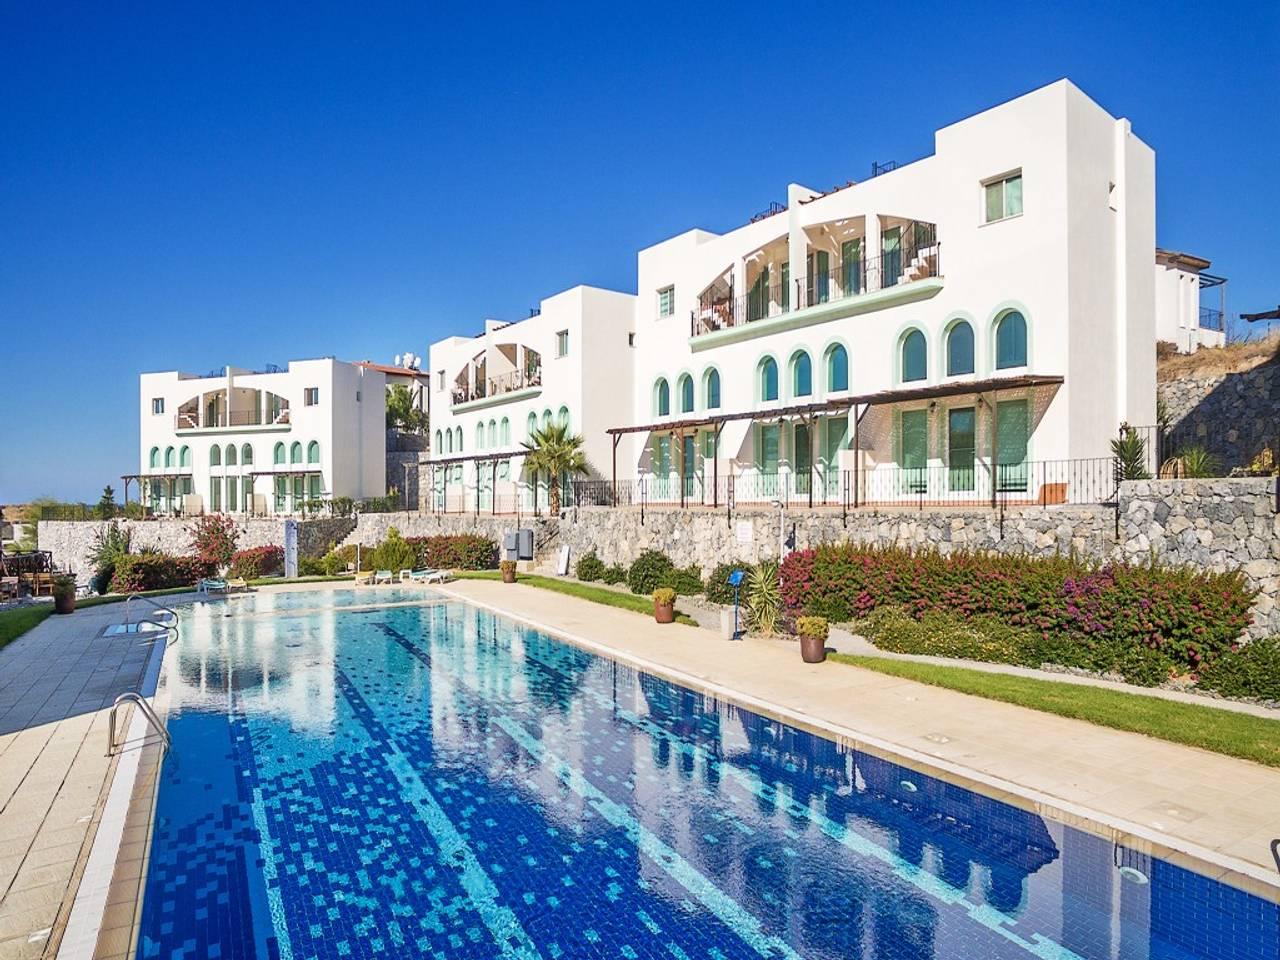 Apartment Joya Cyprus Nightingale Garden Apartment photo 28576319